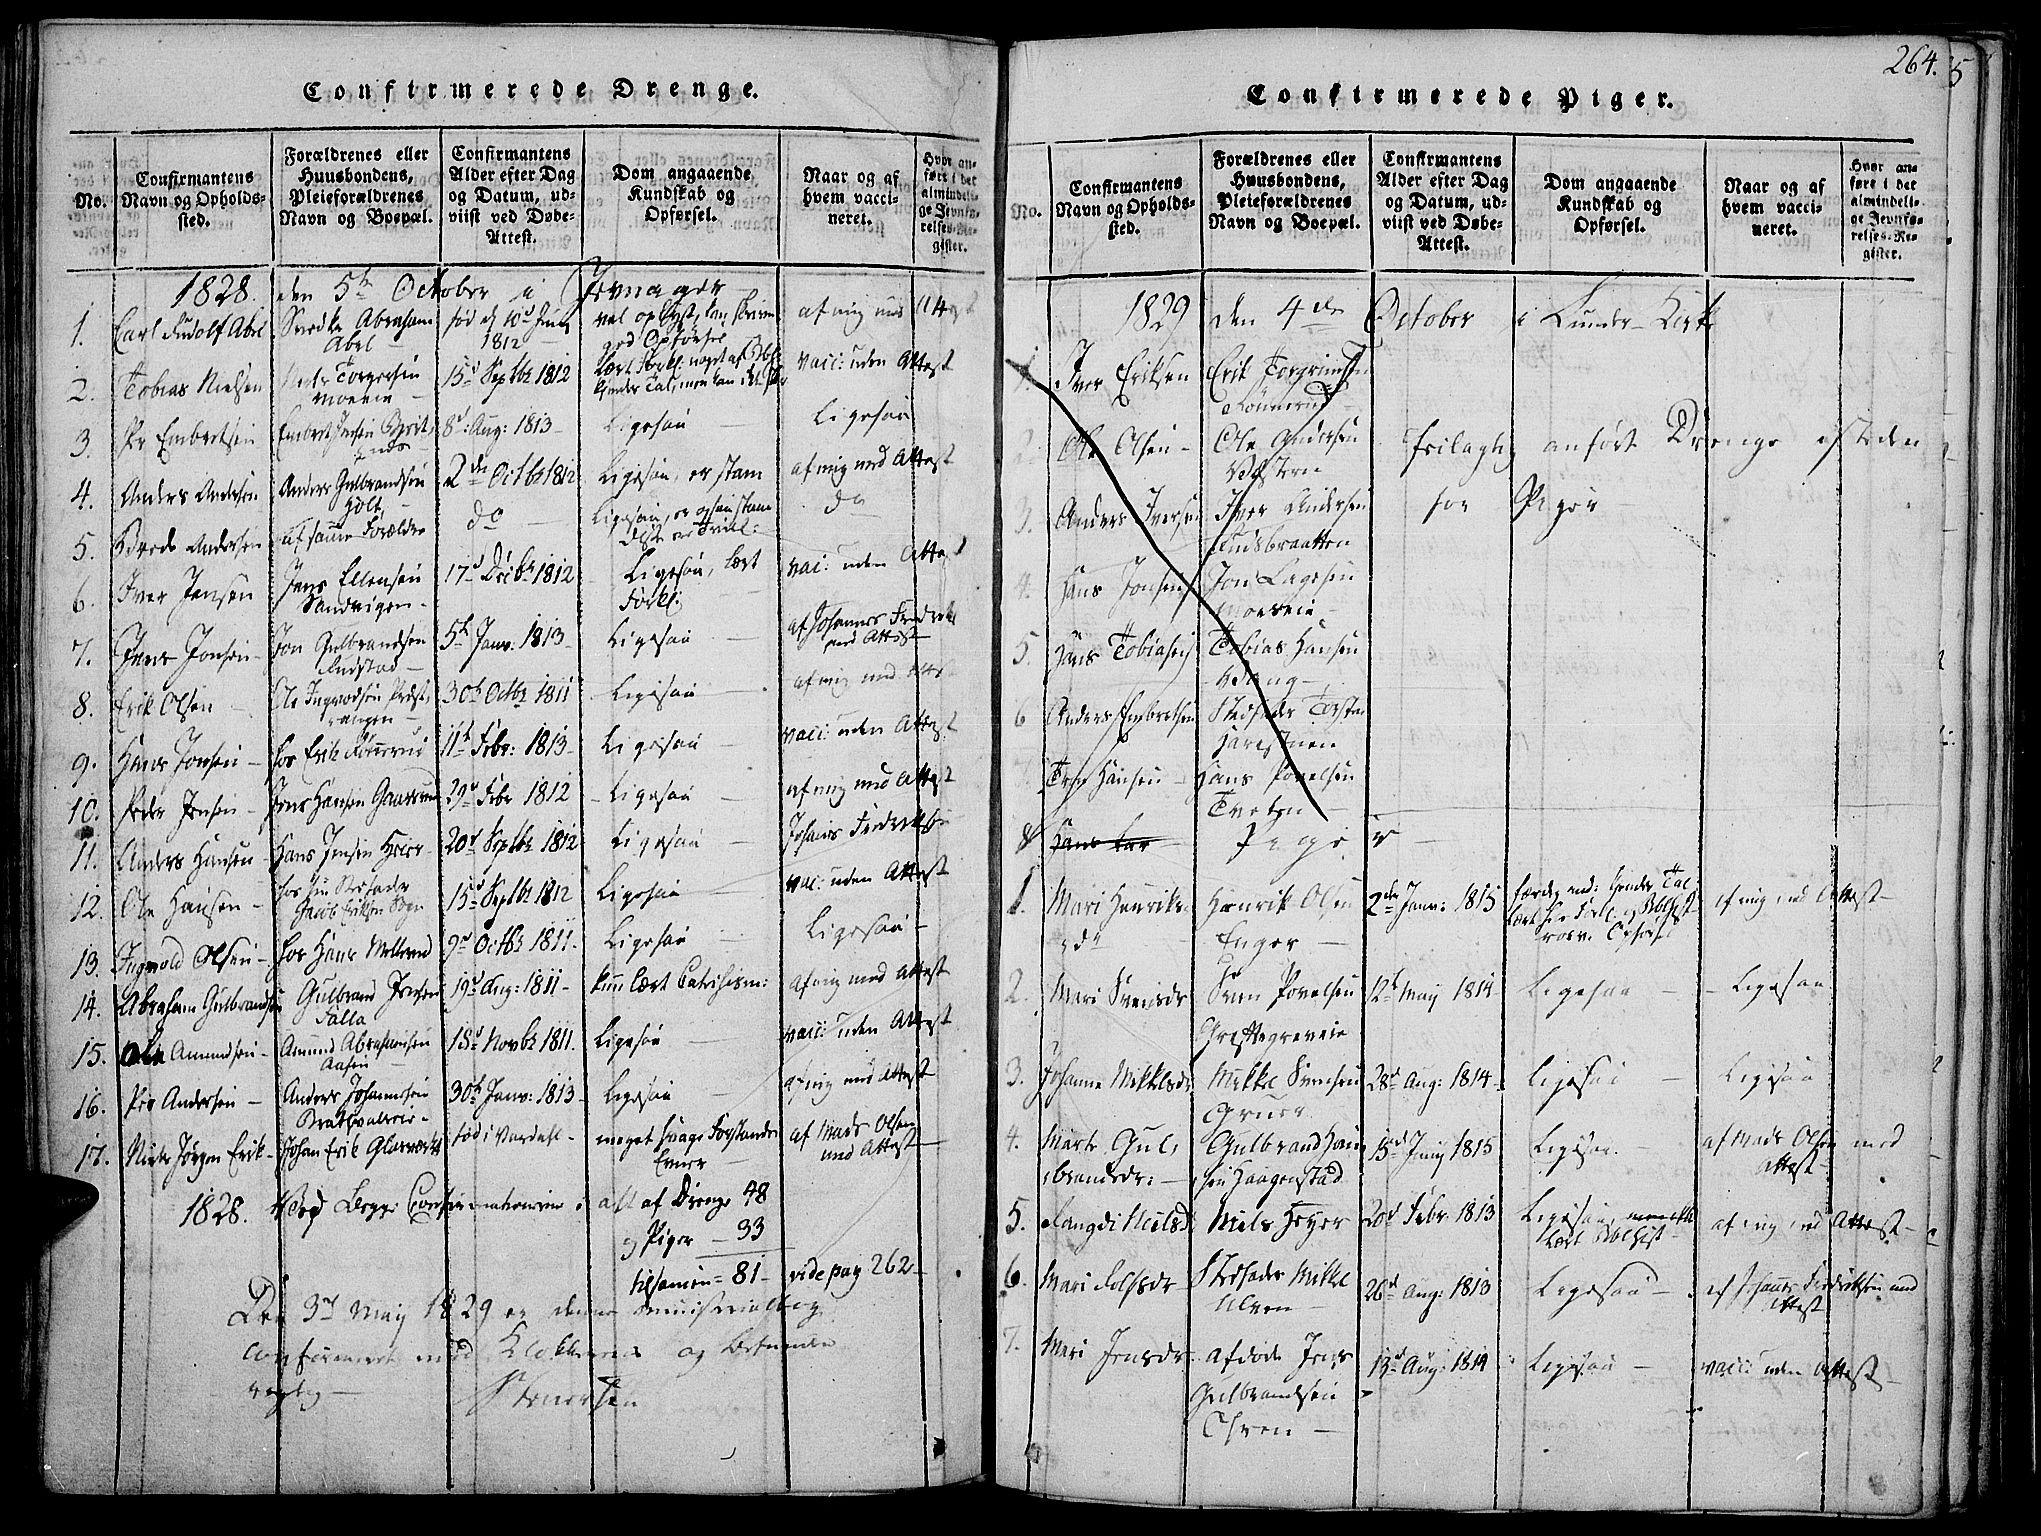 SAH, Jevnaker prestekontor, Ministerialbok nr. 5, 1815-1837, s. 264